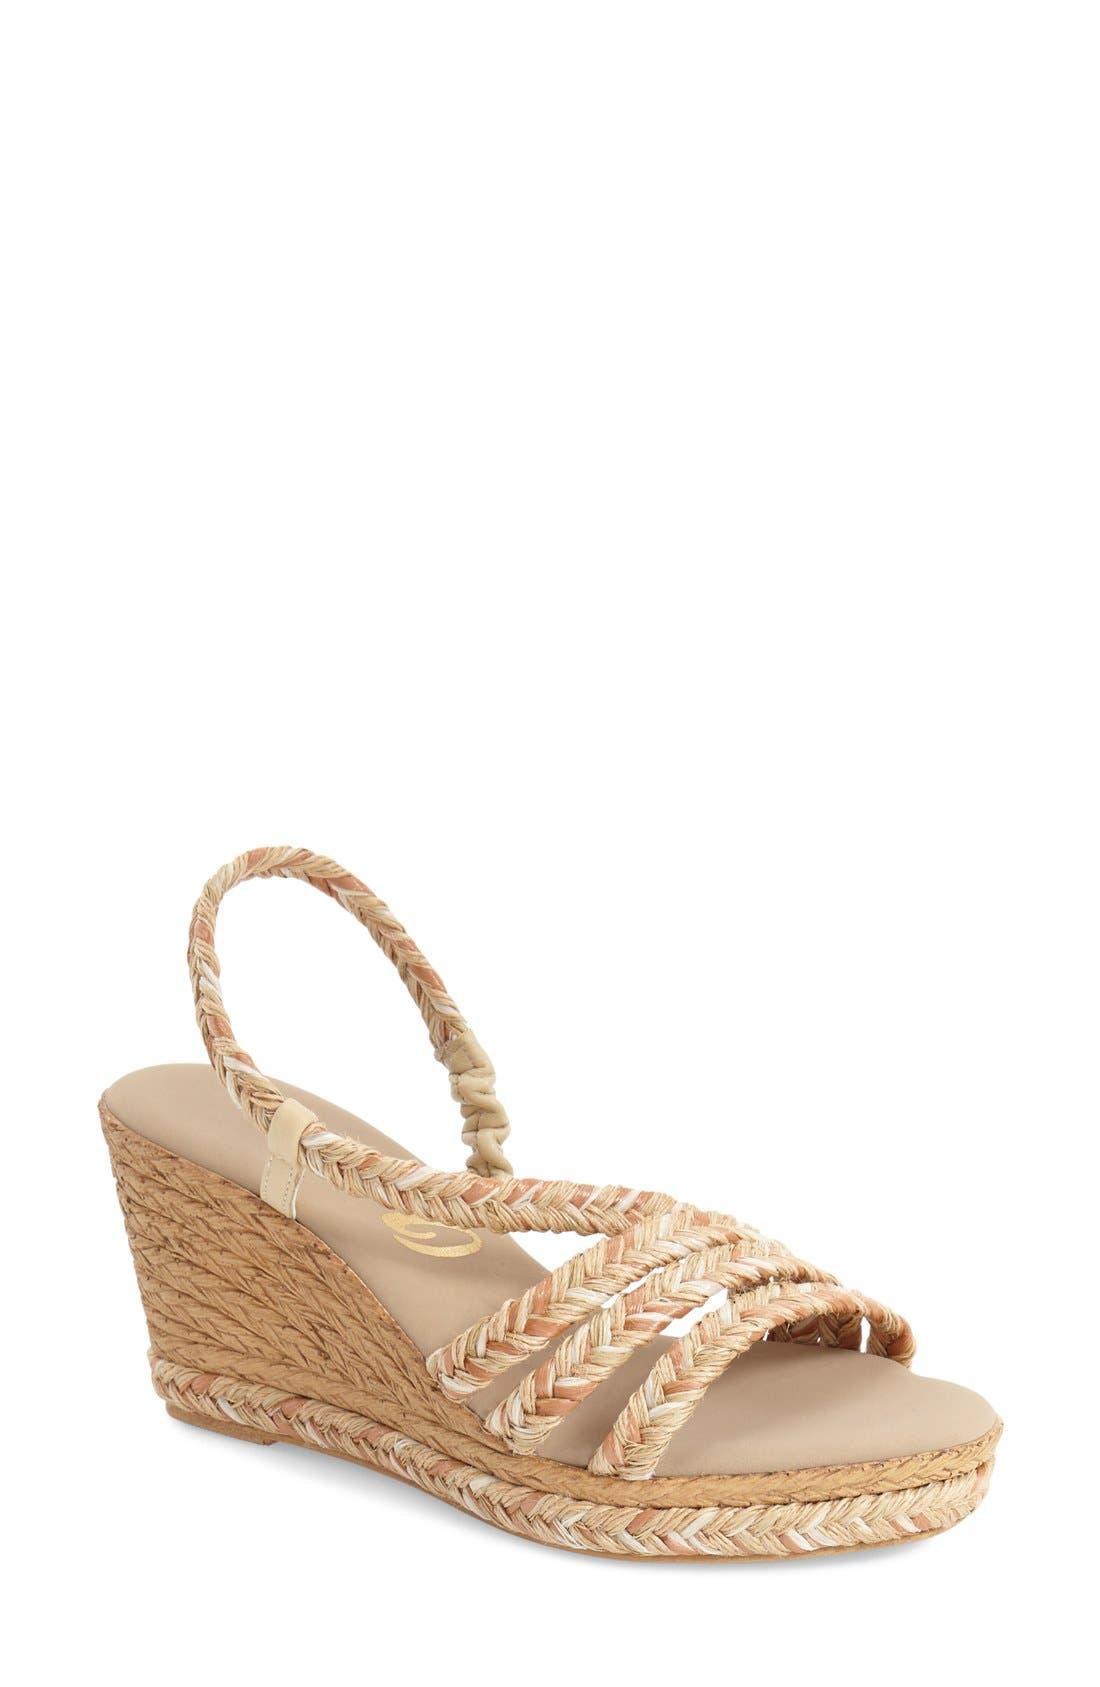 ONEX 'Marcia' Wedge Sandal